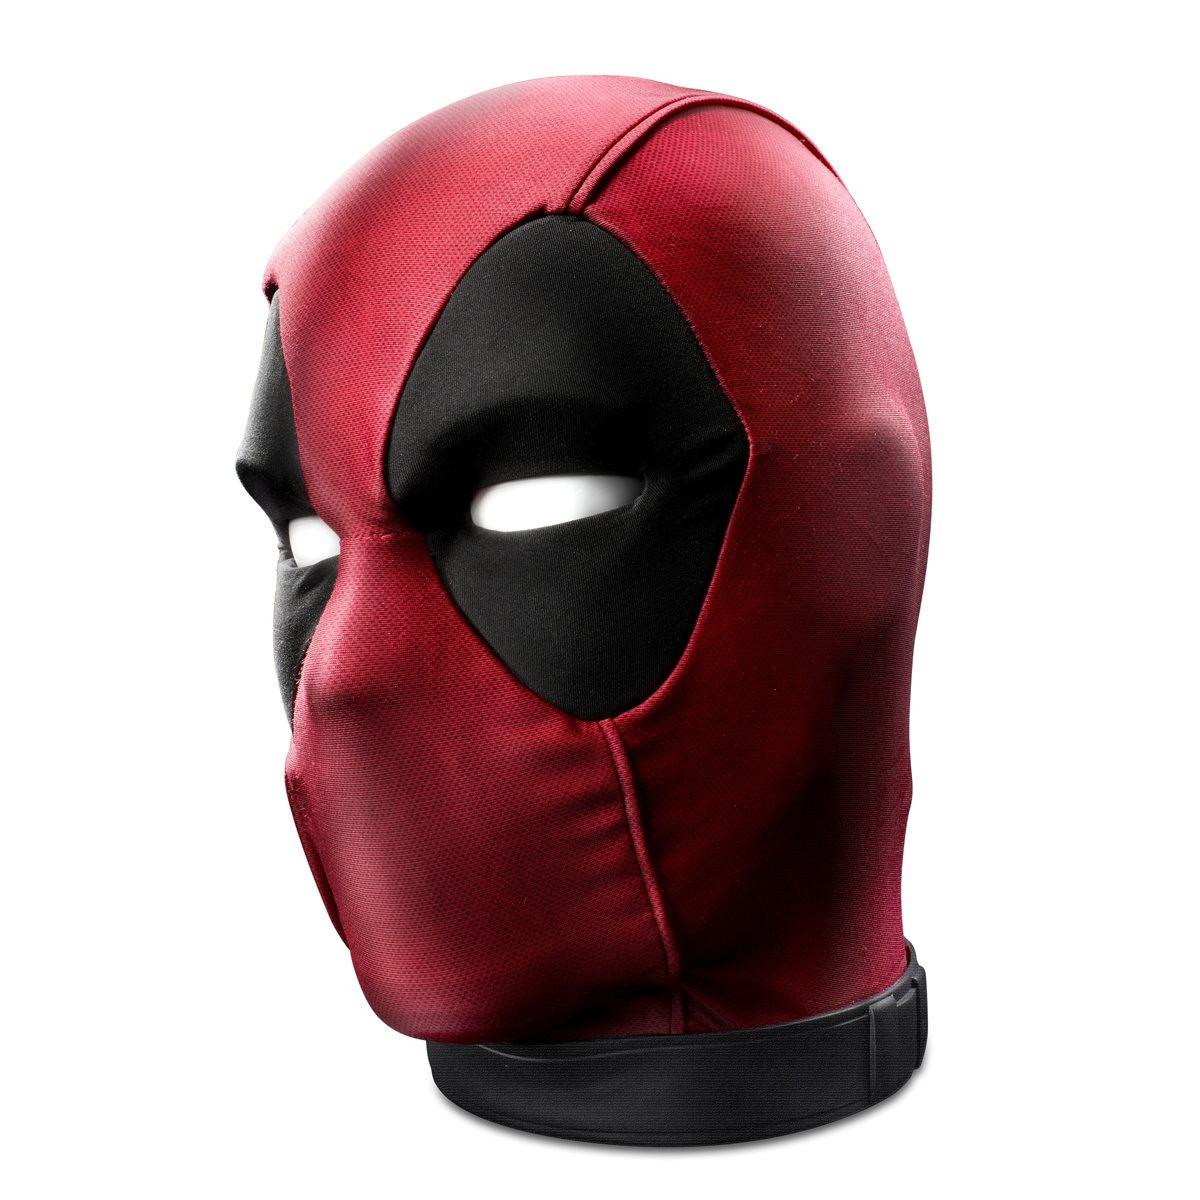 Marvel Legends Interactive Electronic Deadpool S Head